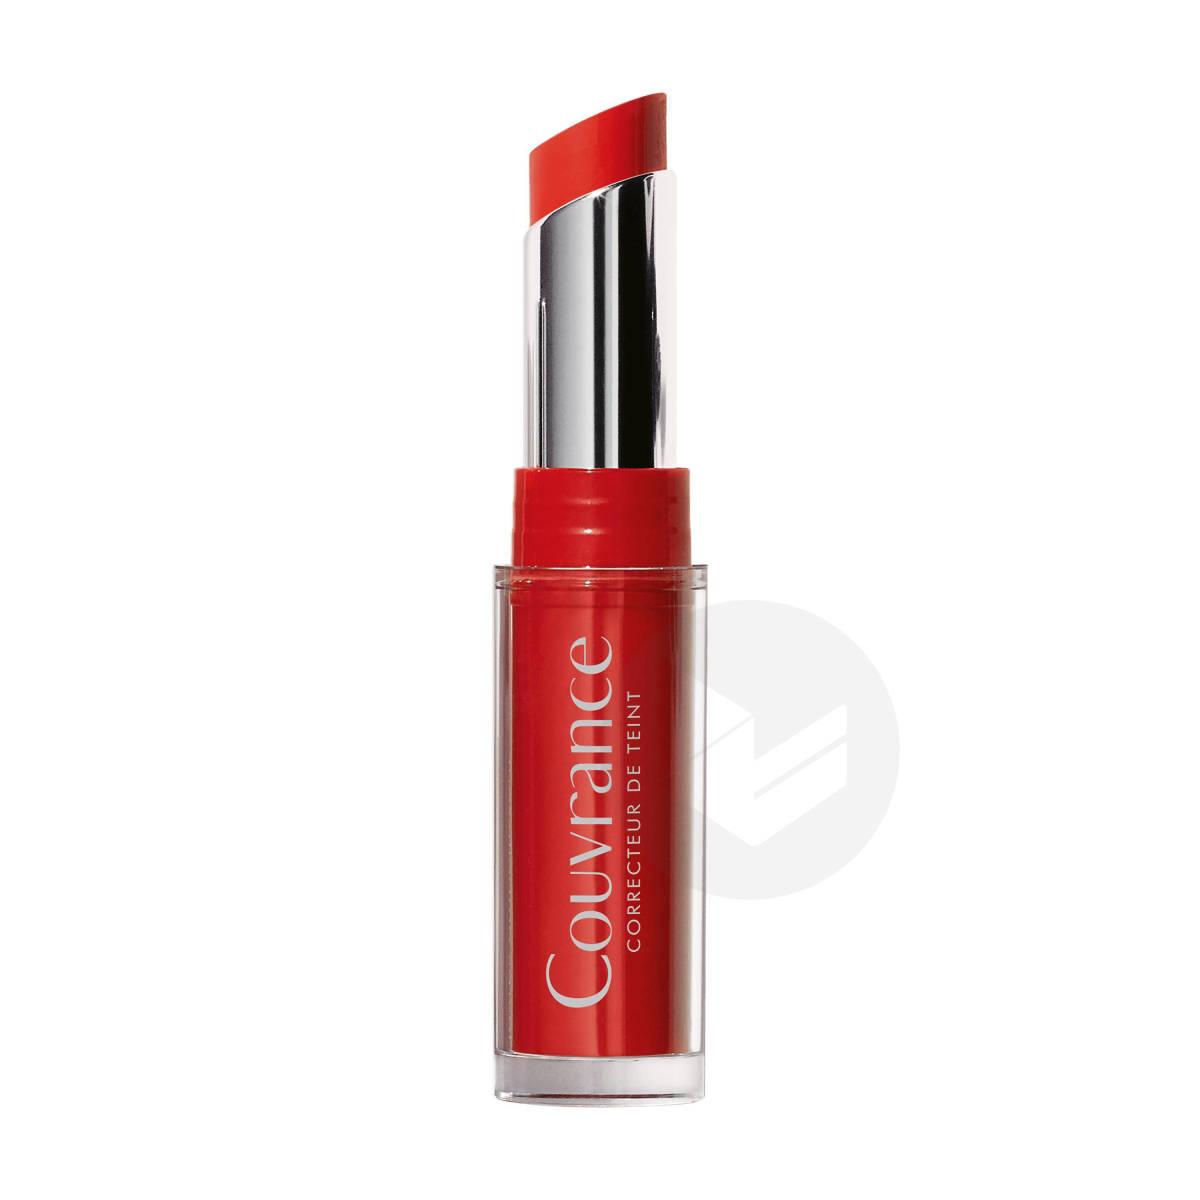 Baume Embellisseur Lèvres Rouge Eclat 3g